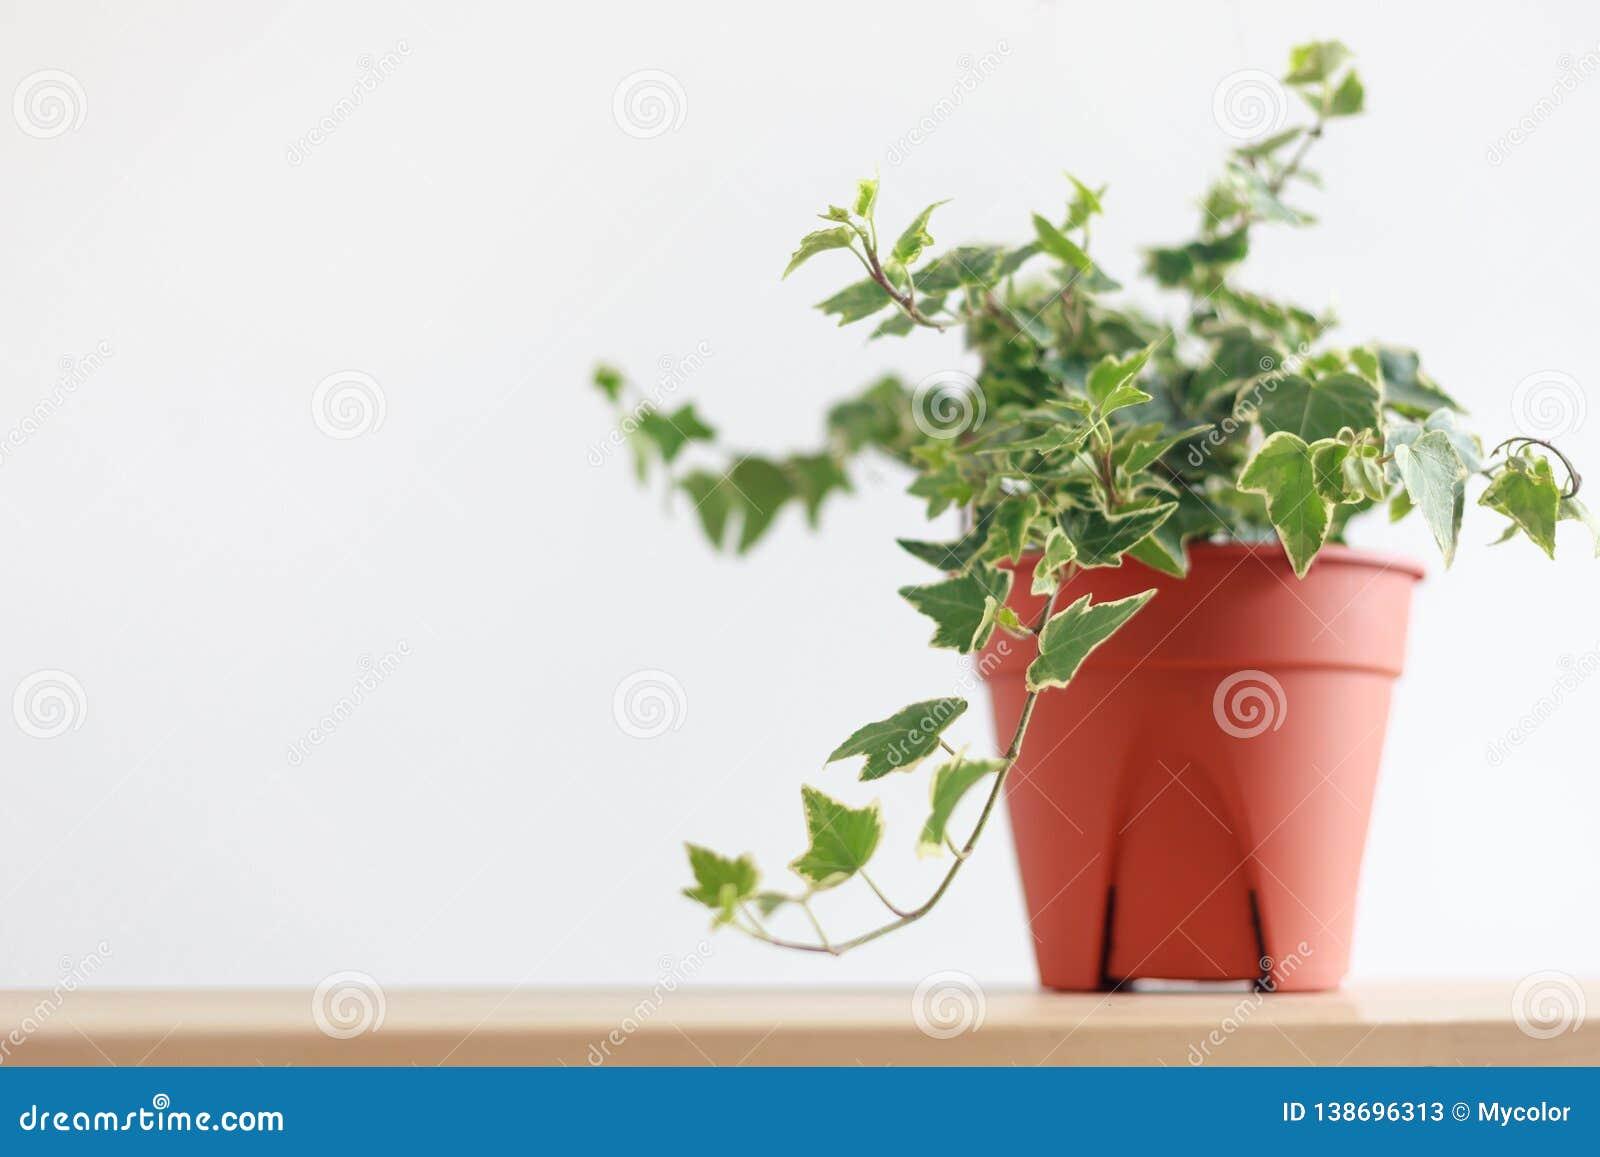 English Ivy Plant In Pot On Wood Table Stock Image - Image ... on ivy houseplant, yucca elephantipes house plant, ivy water plant, ivy ice plant, ivy flower, ivy indoor plant,